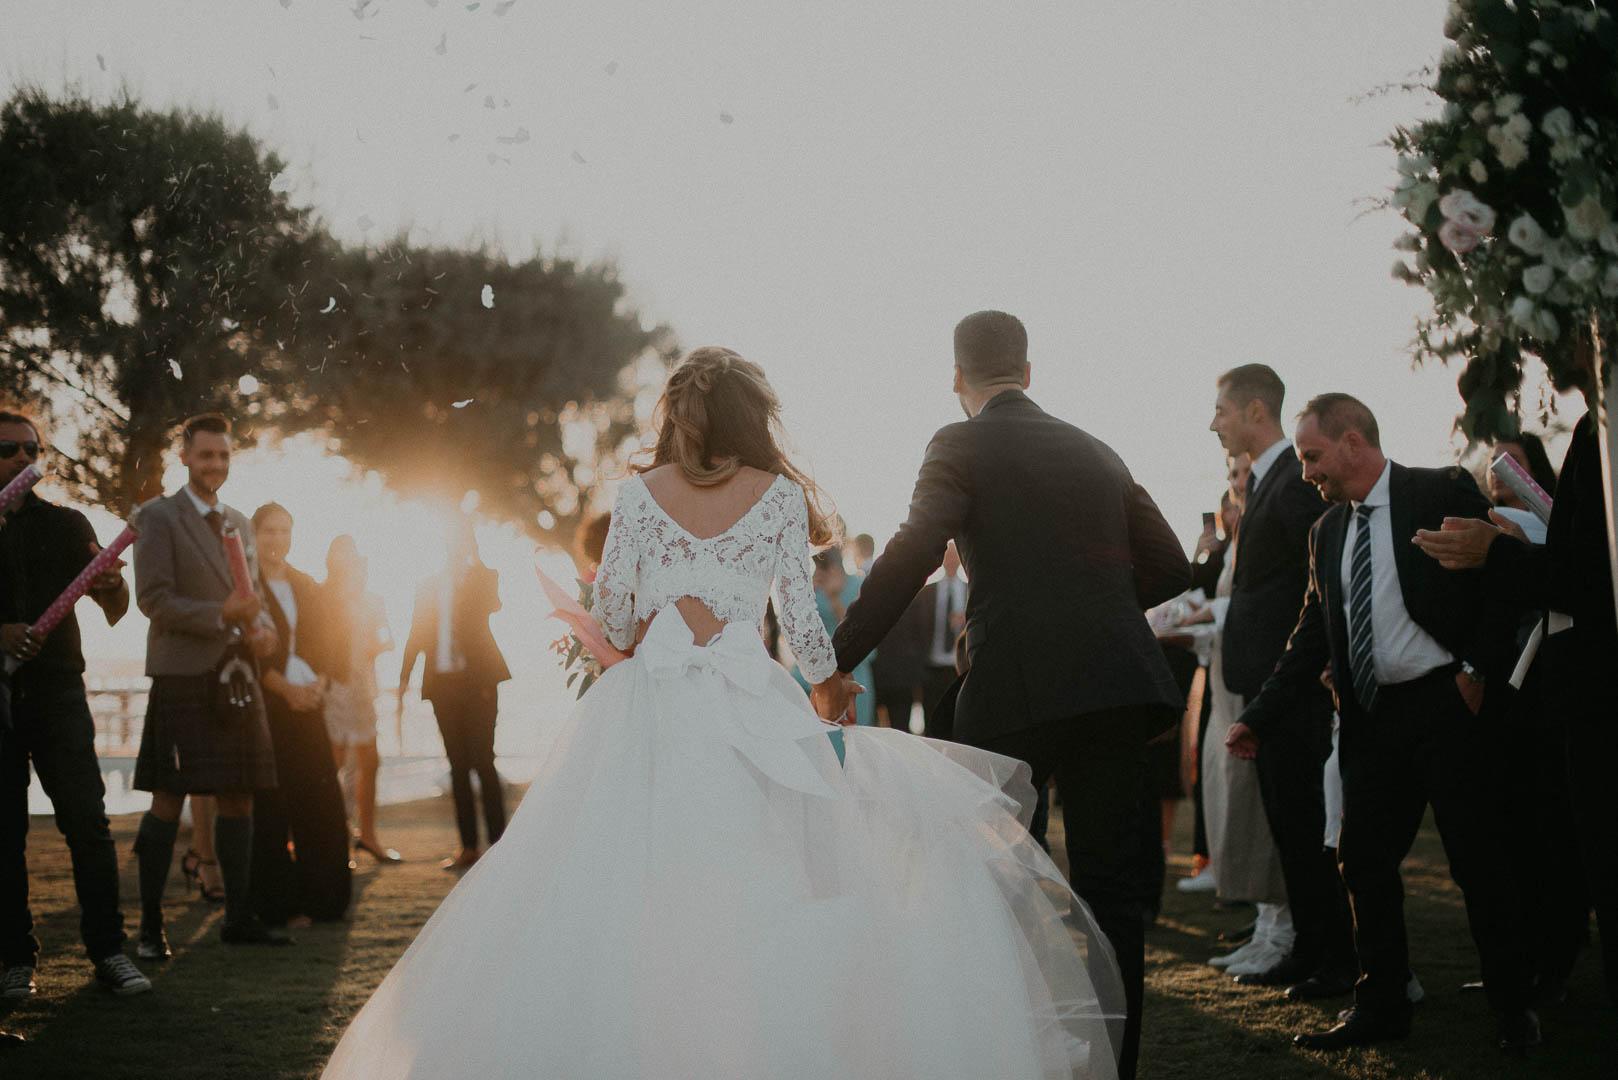 wedding-photographer-destination-fineart-bespoke-reportage-napoli-nabilah-vivianeizzo-spazio46-104